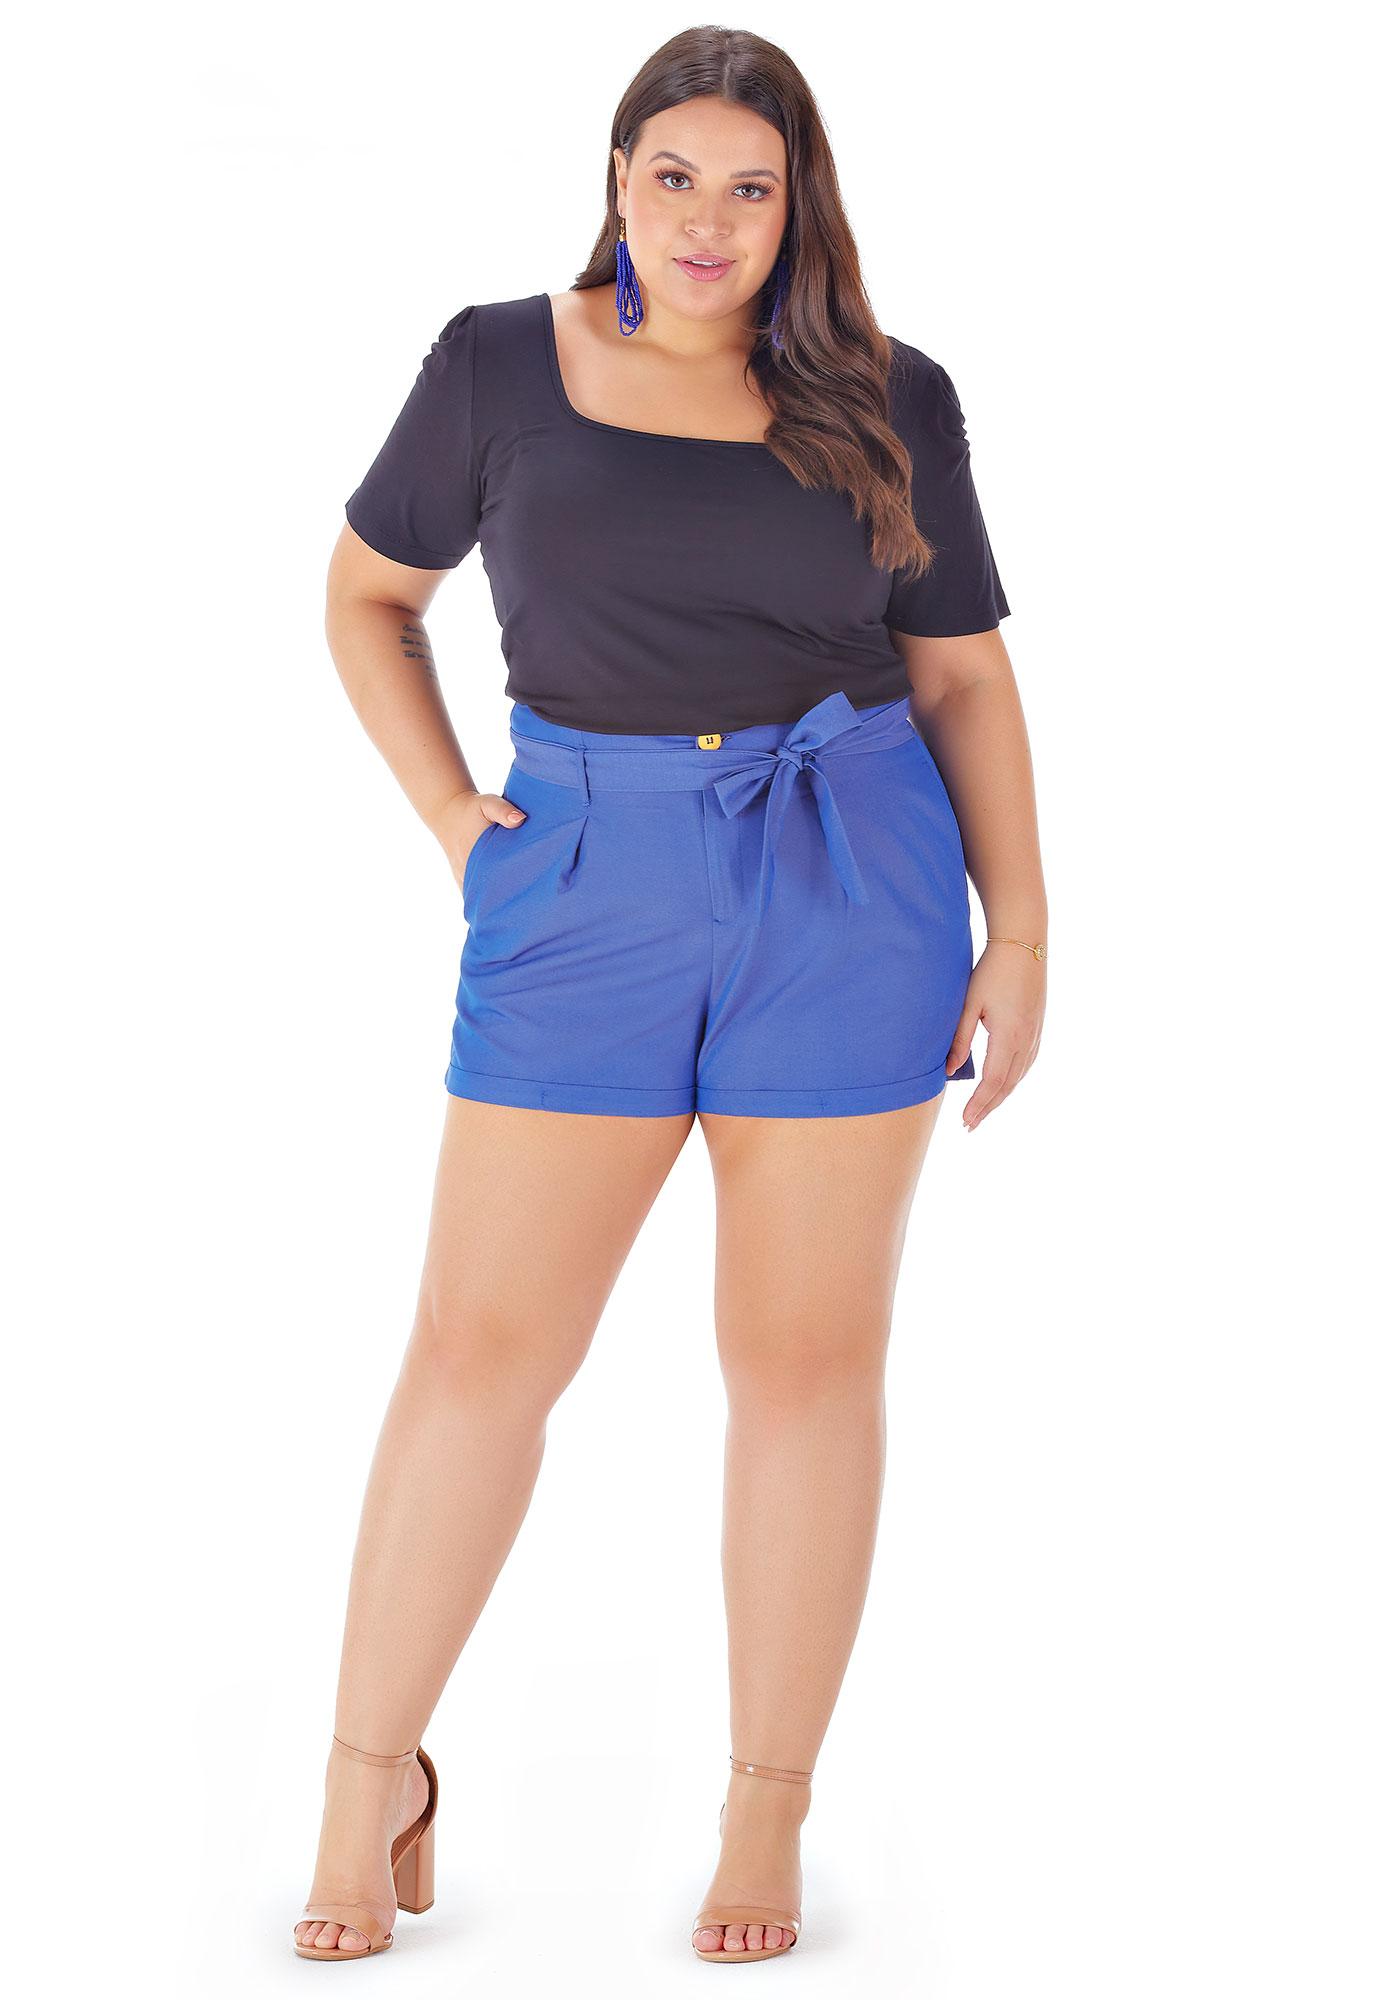 Bermuda Lepoque Plus Size em Tecido Denin (Jeans Escuro)